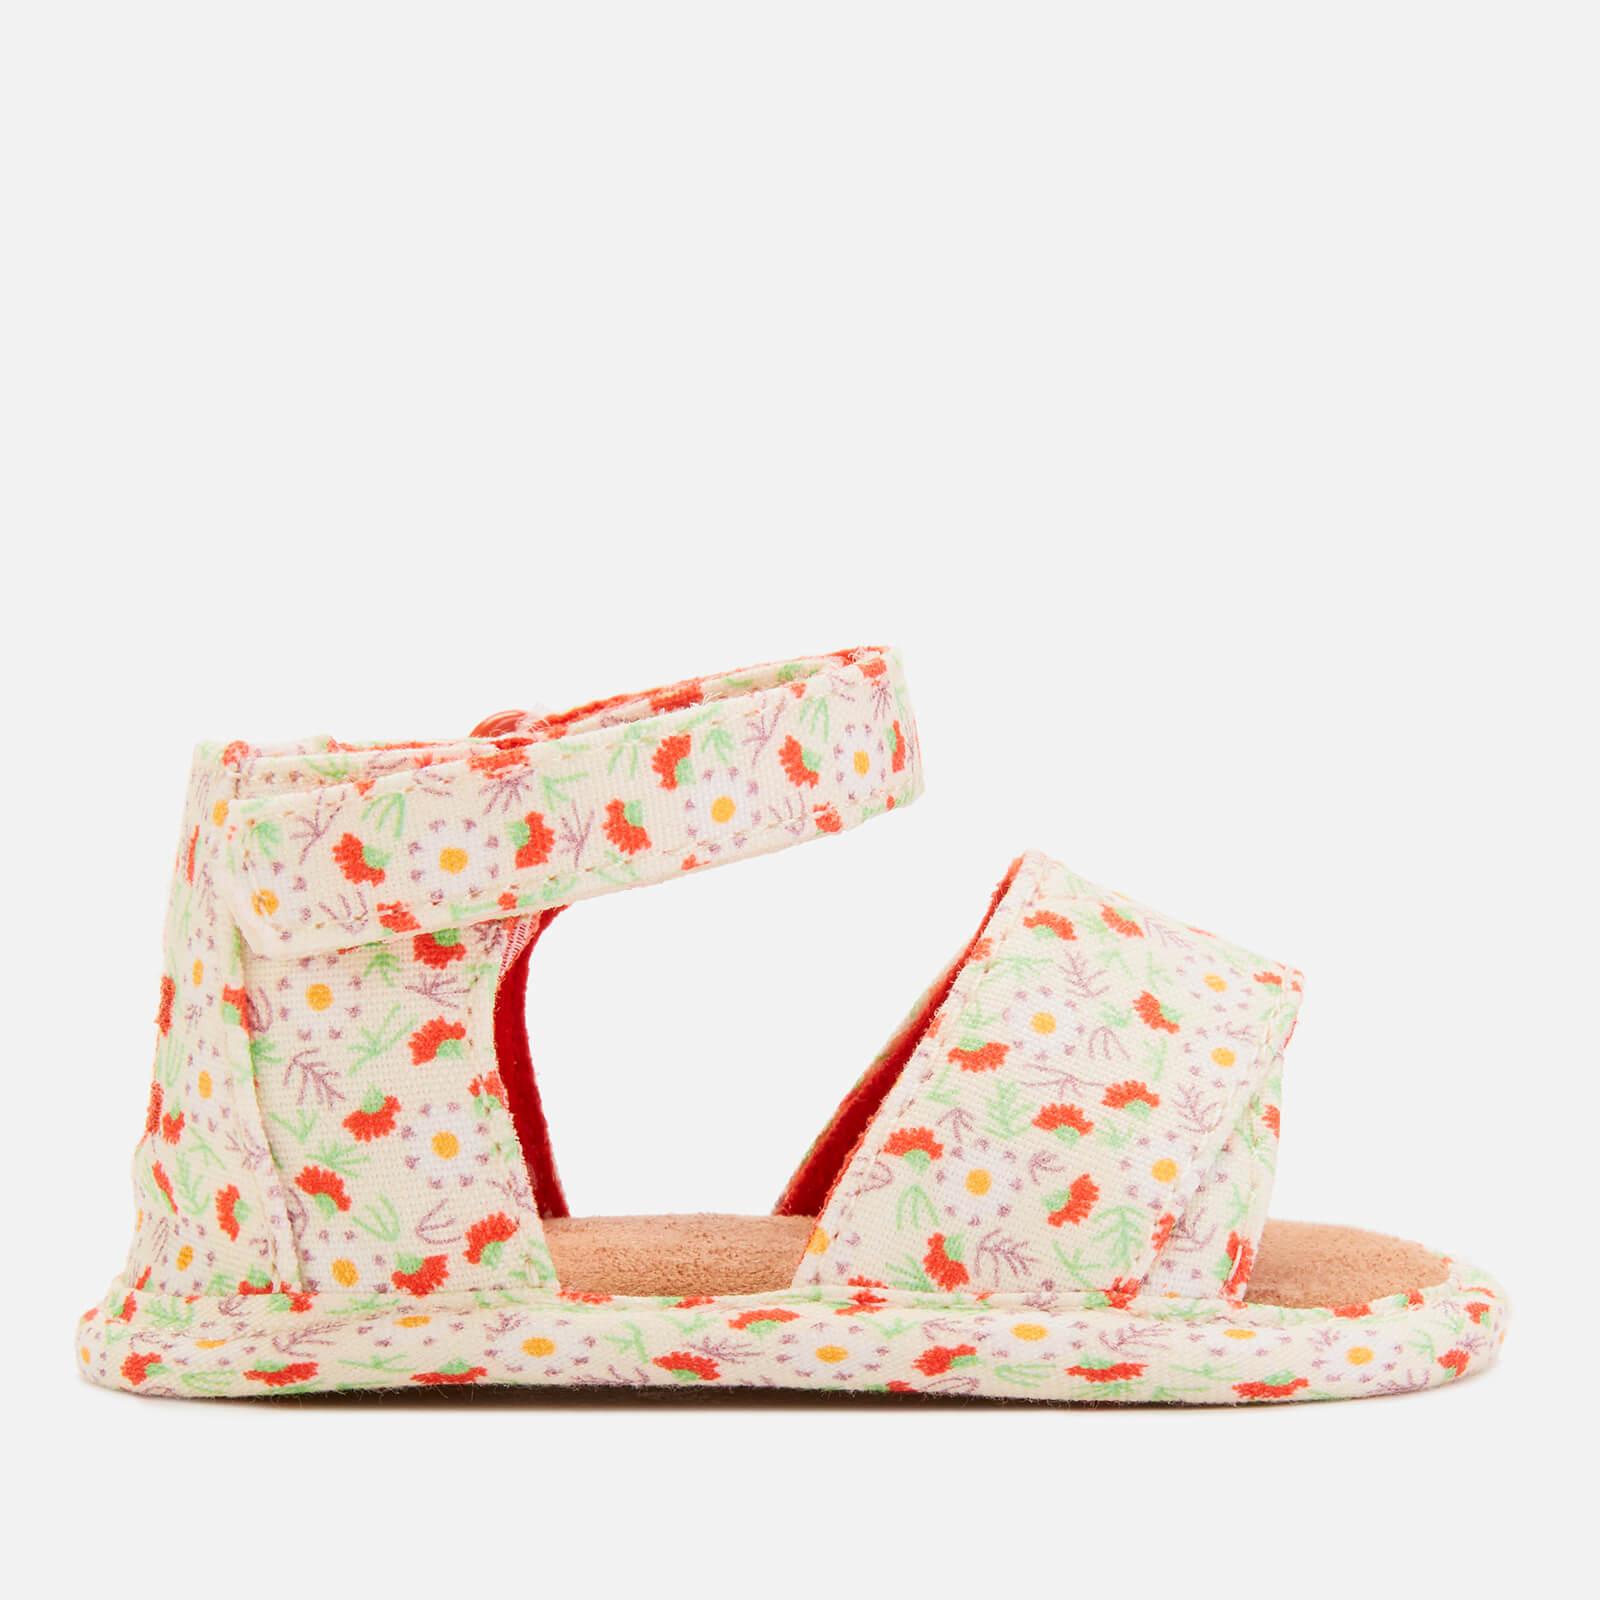 TOMS Babie's Shiloh Sandals - Floral - UK 3 Baby - Multi